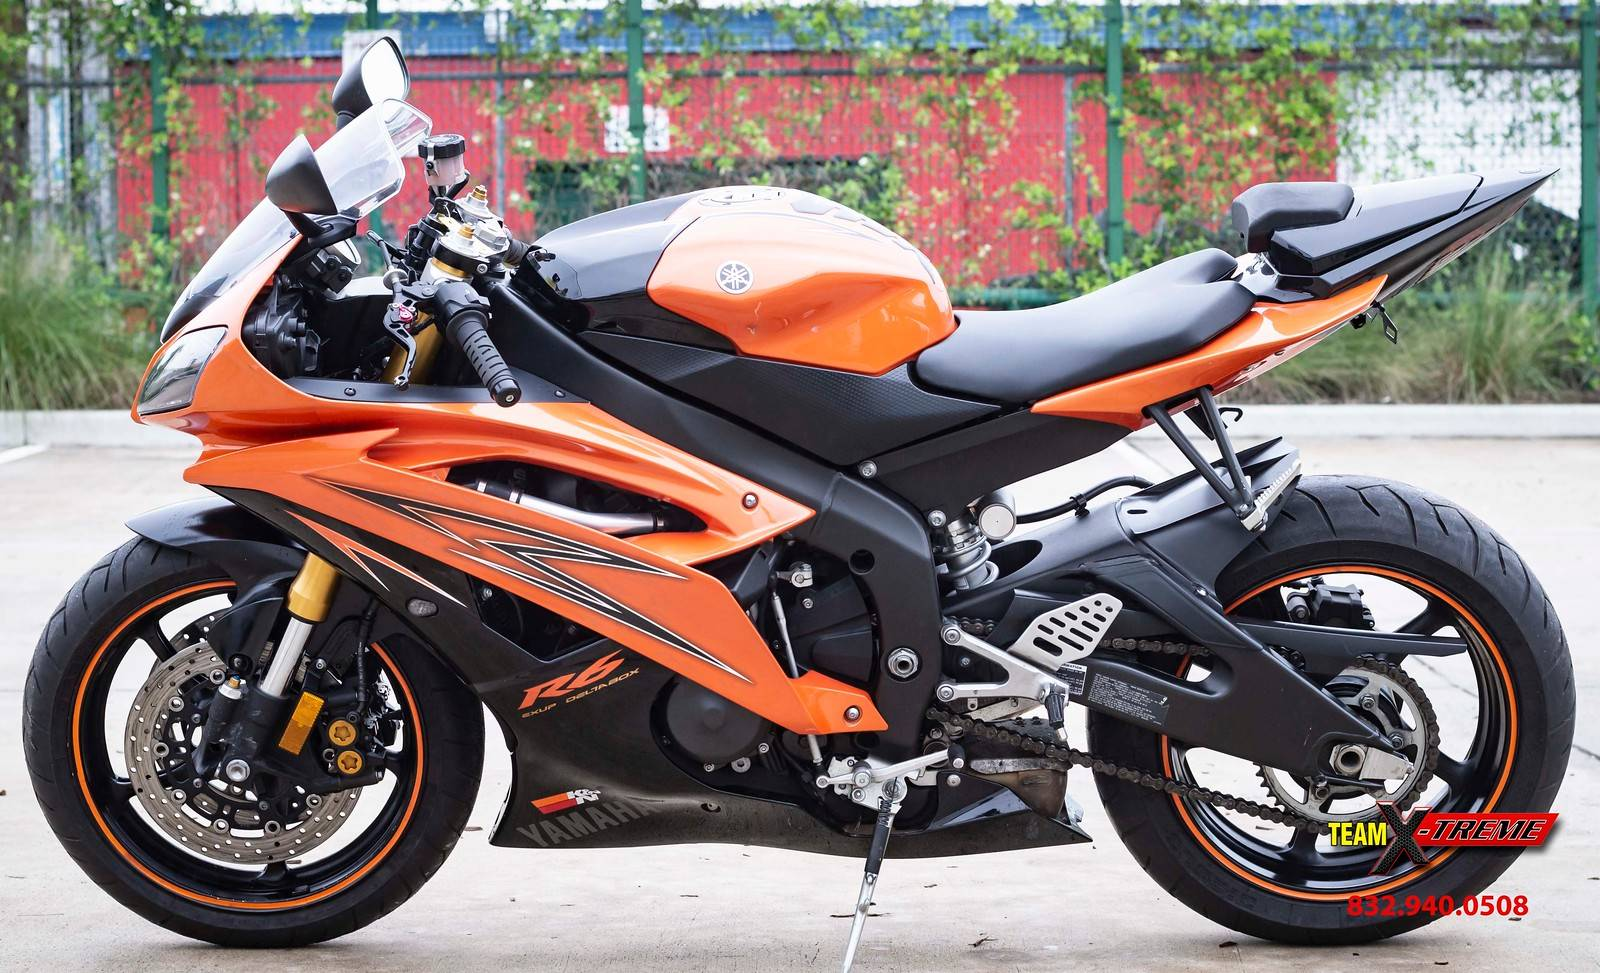 2009 Yamaha YZF-R6 6